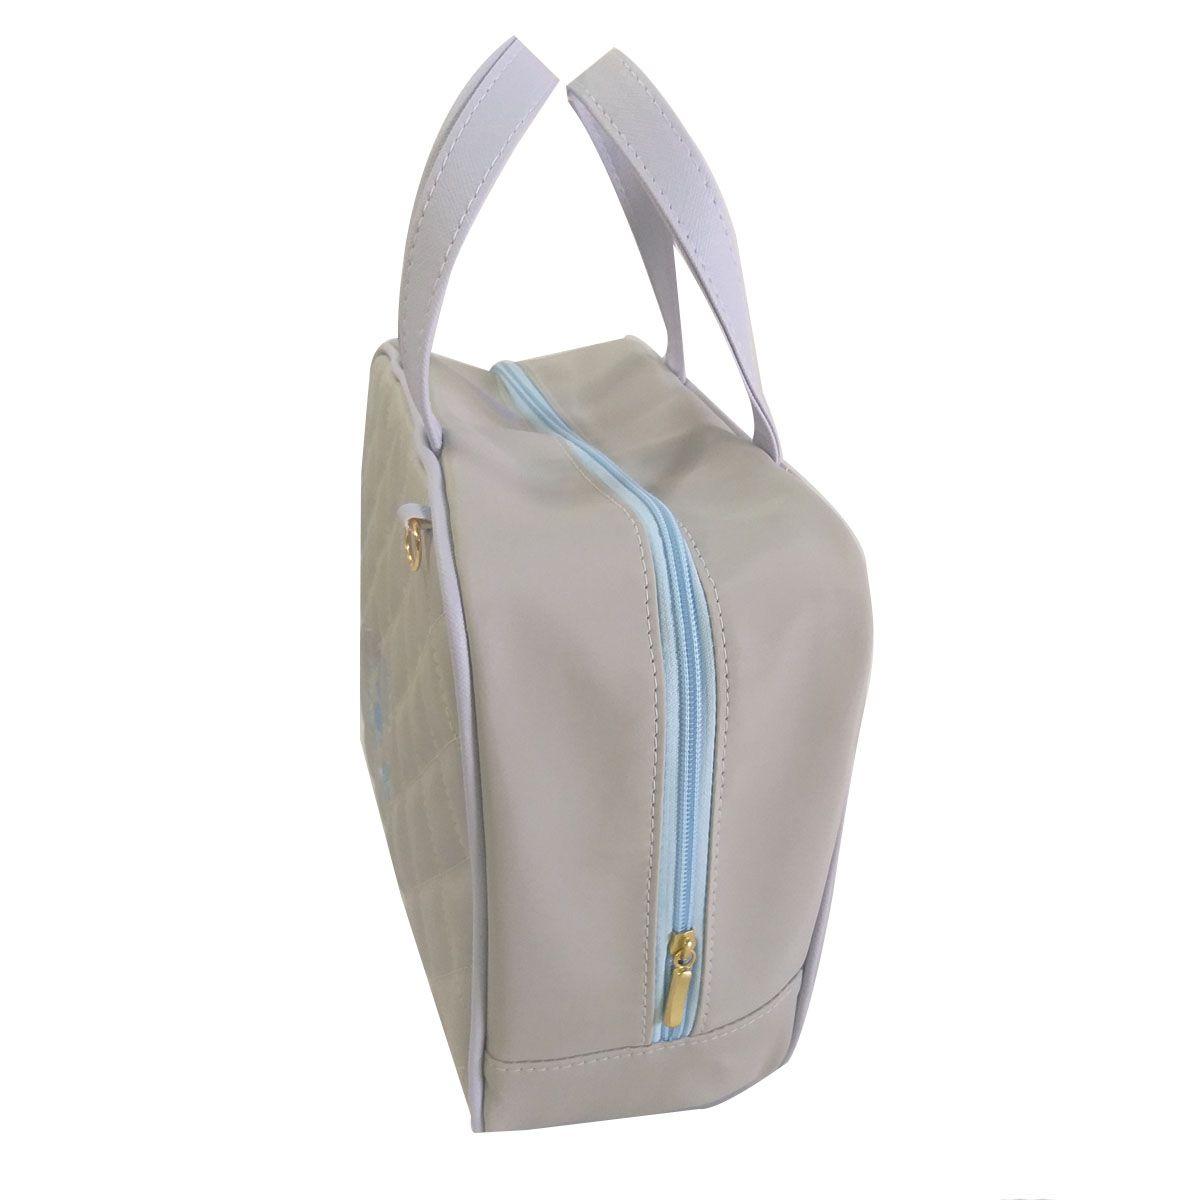 Kit Bolsa Maternidade Completo Cinza com Azul Matelasse